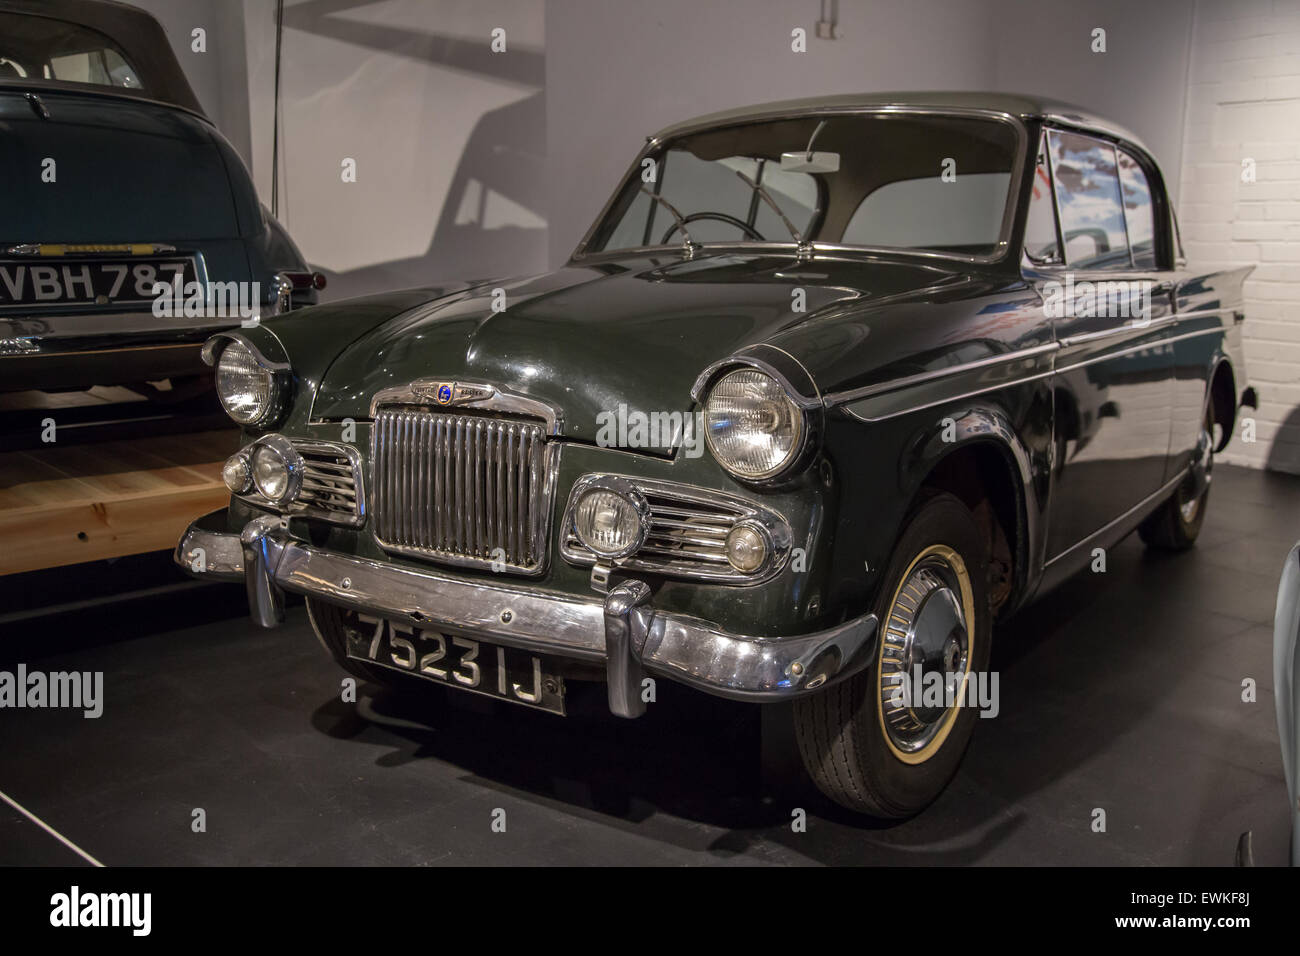 1964 Singer Gazelle motorcar - Stock Image